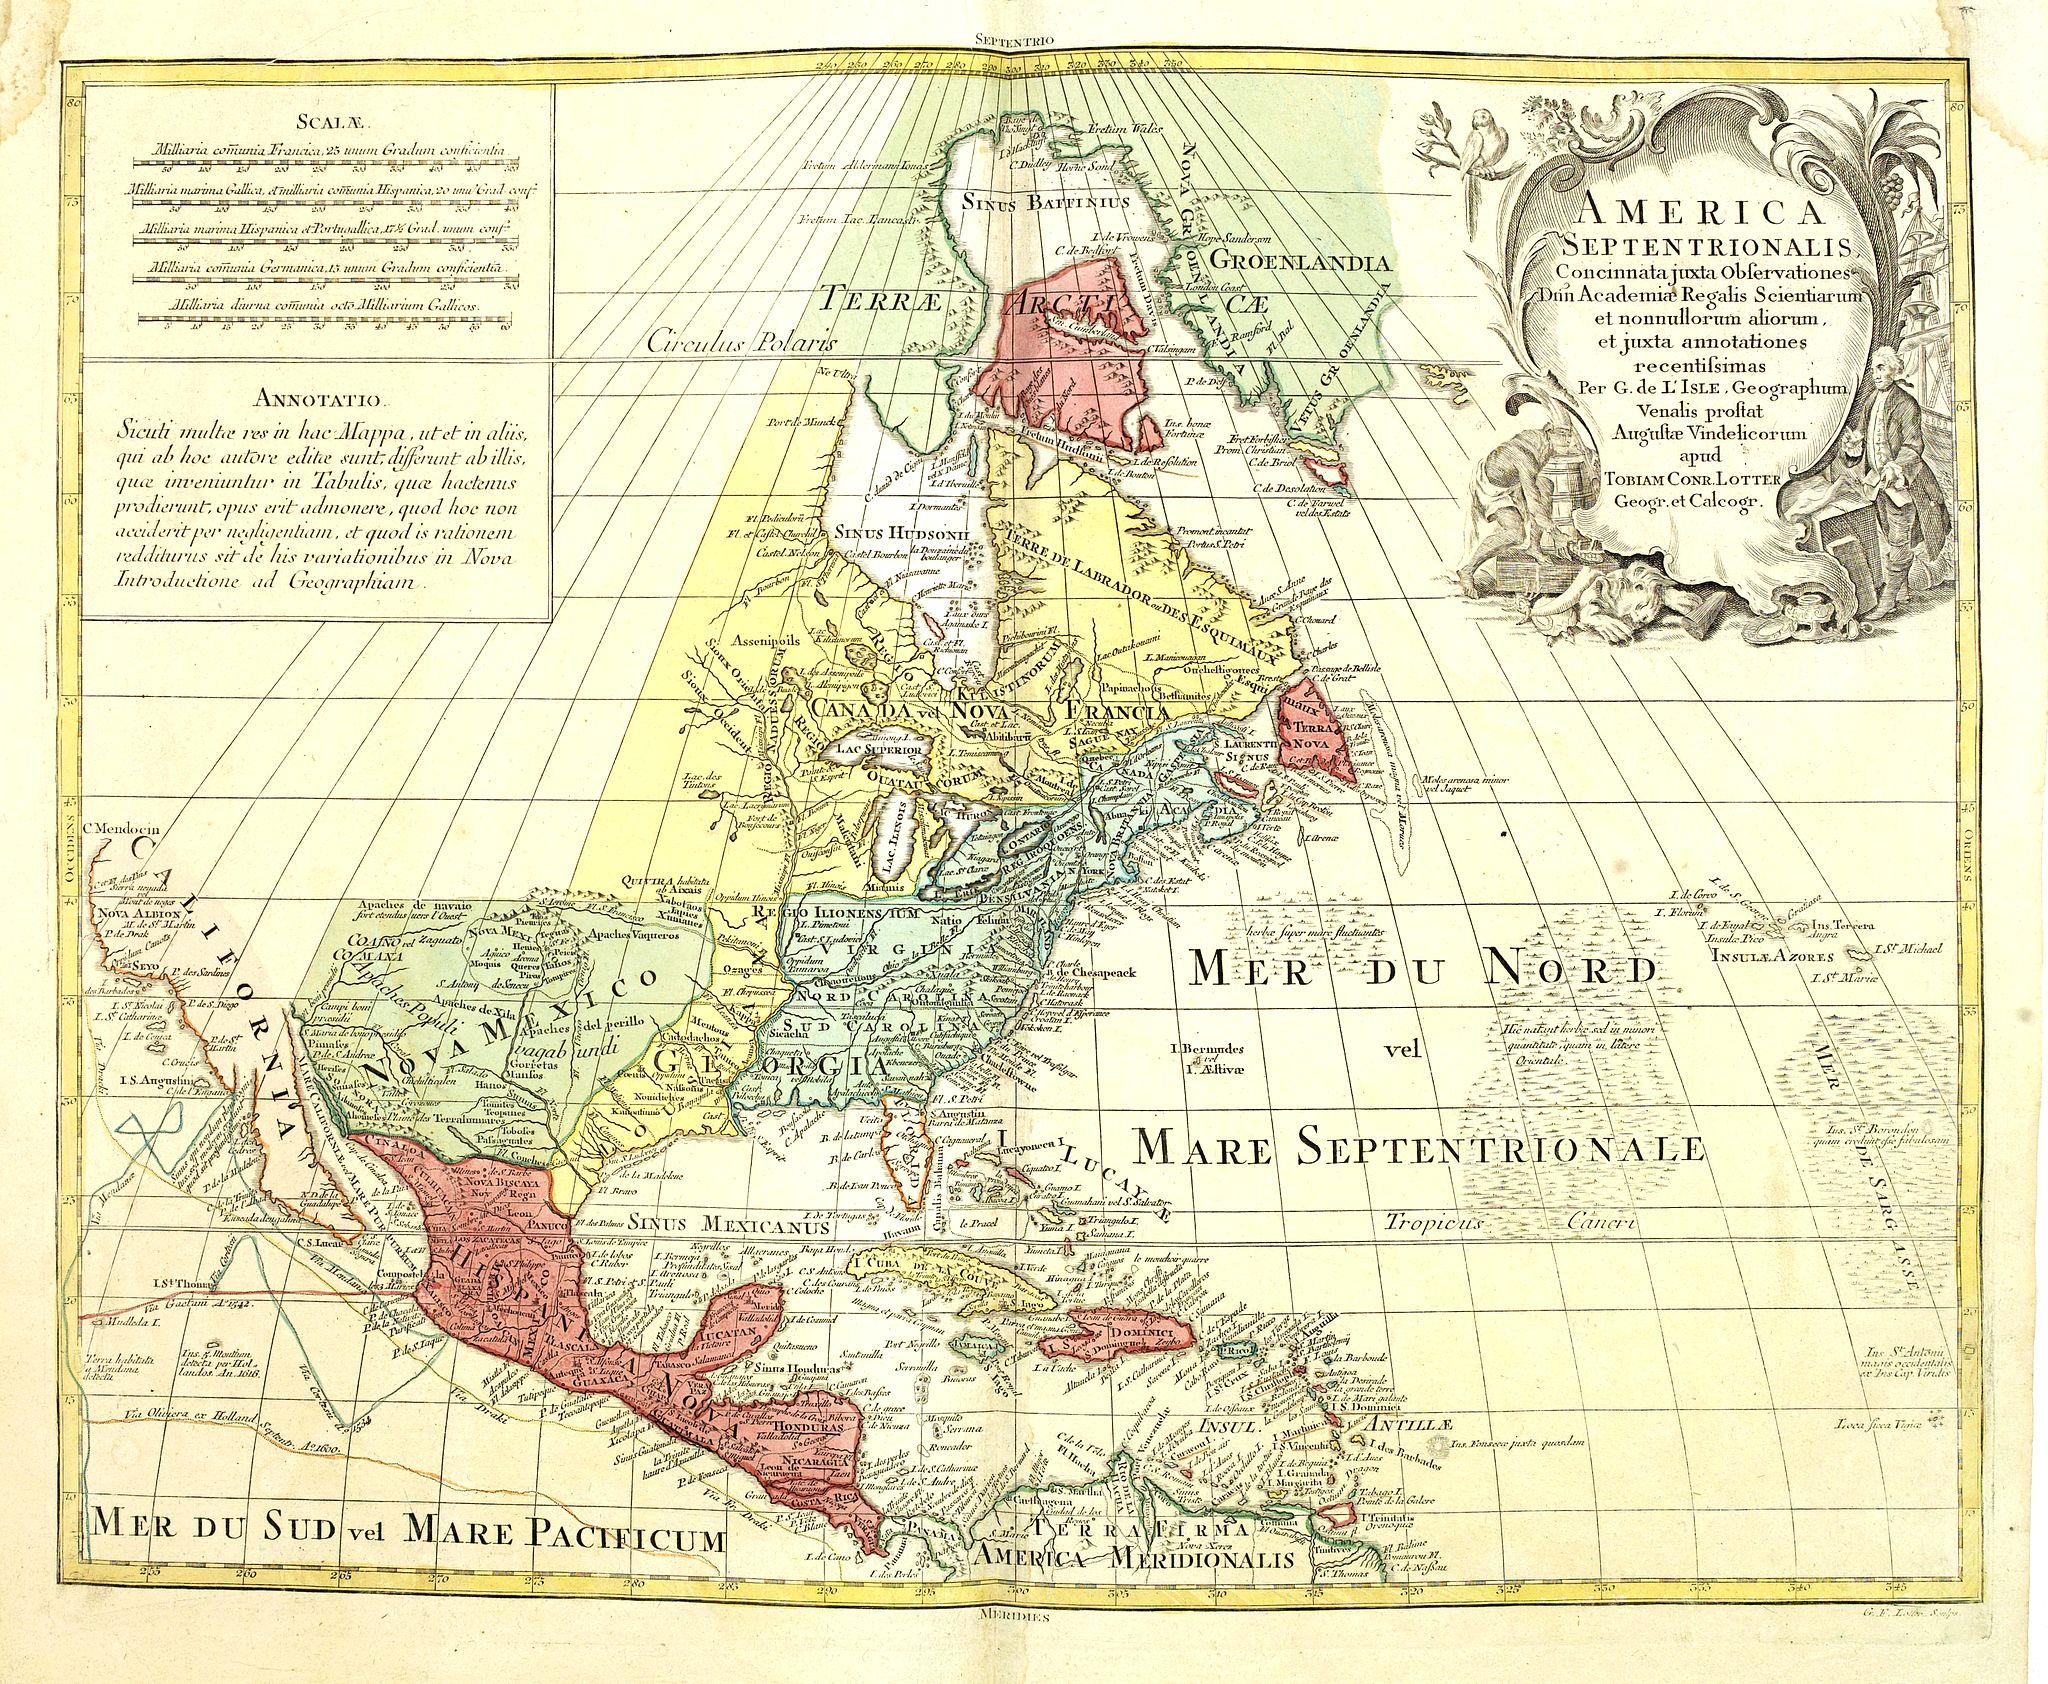 LOTTER, T.C. -  America Septentrionalis, Concinnata juxta Observationes..